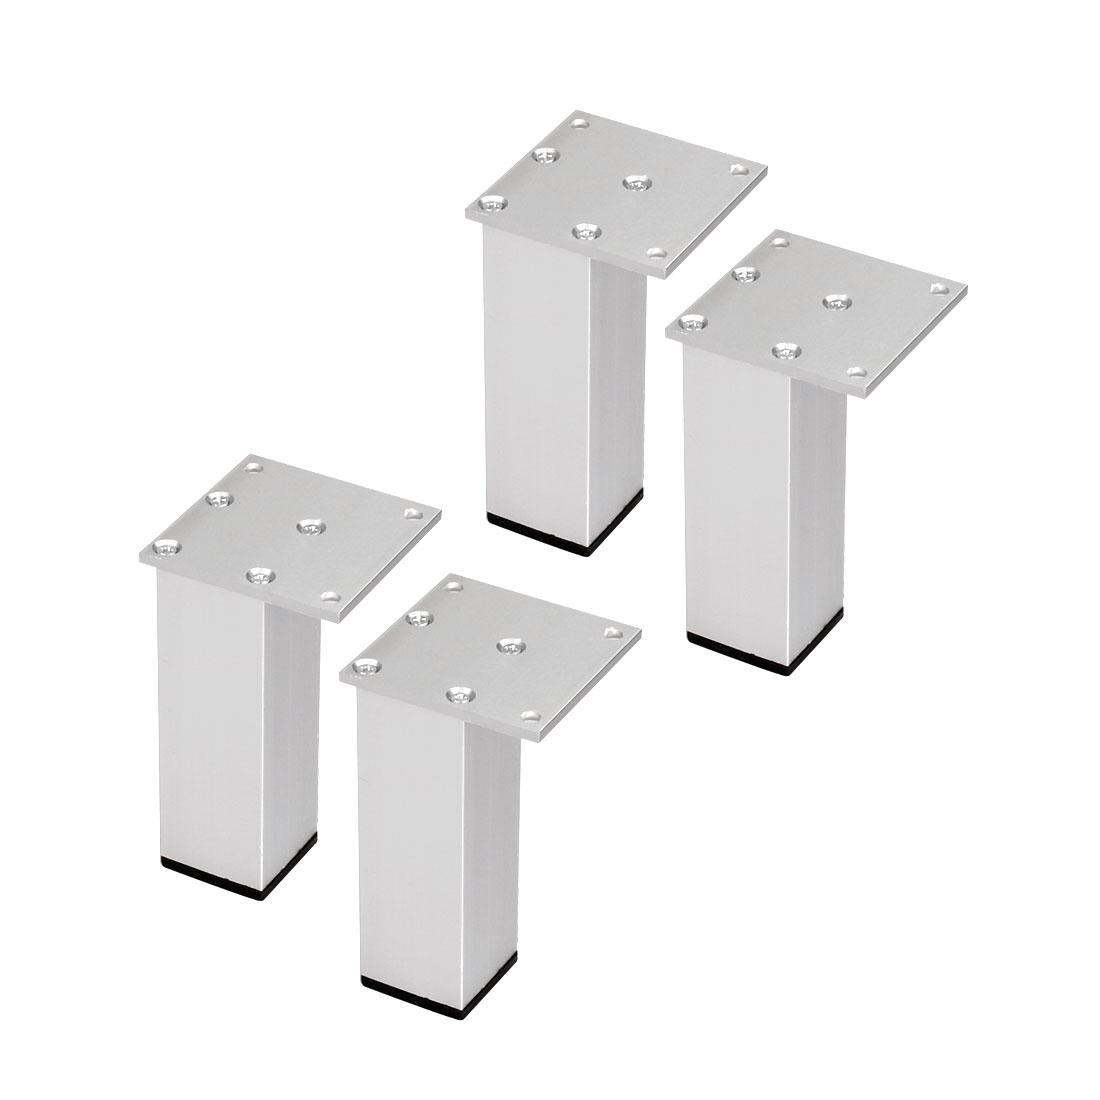 "5"" Furniture Legs Aluminium Alloy Table Feet Replacement Height Adjuster 4pcs"